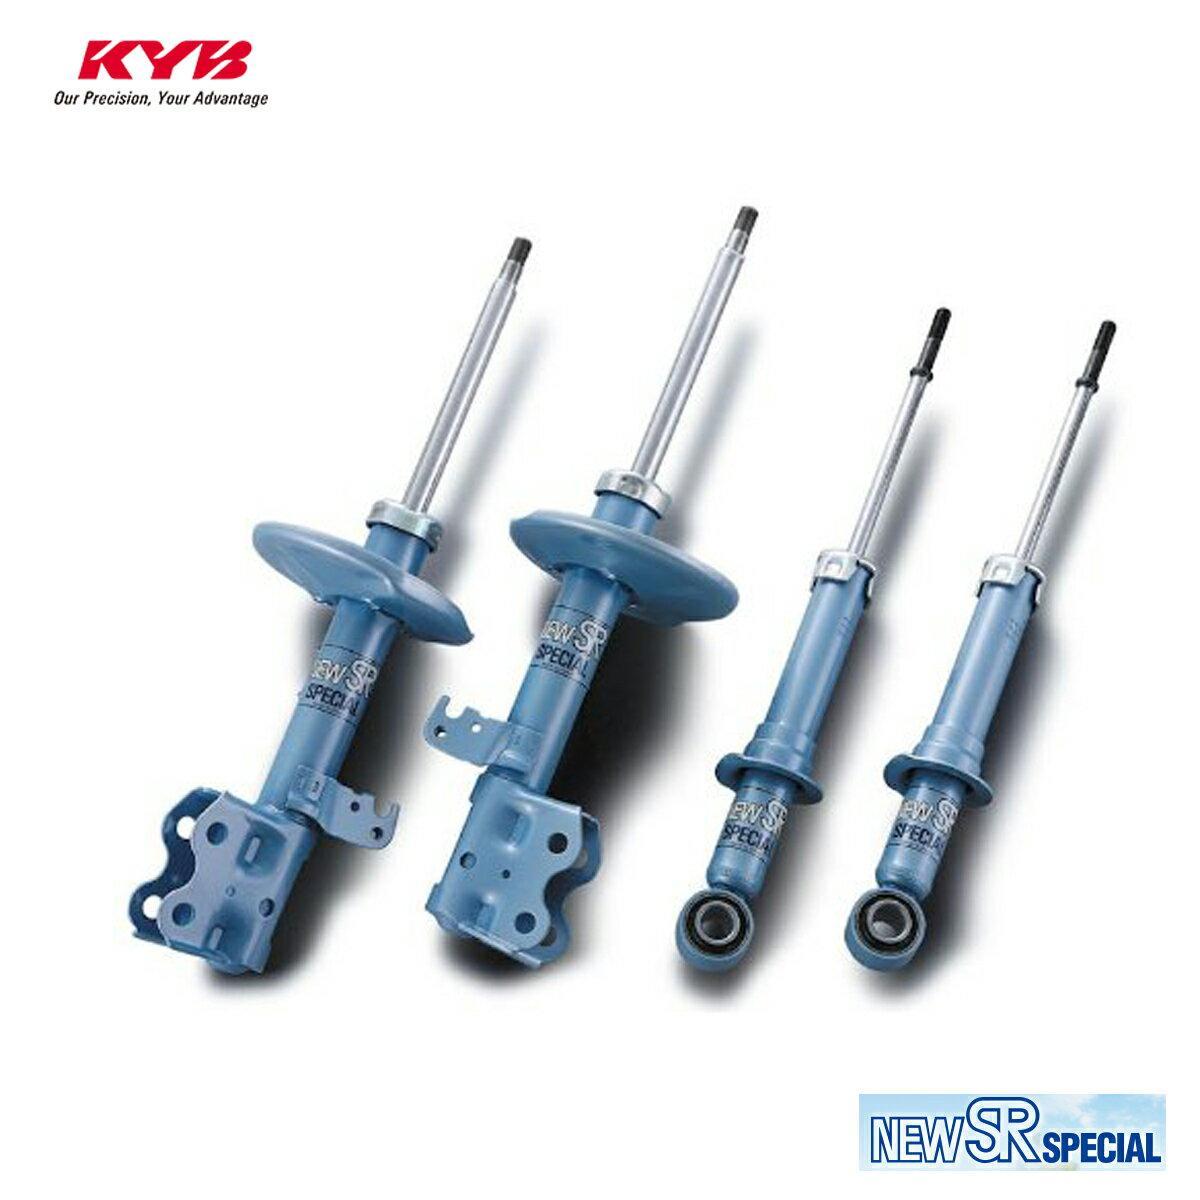 KYB カヤバ アクセラ BM5FS ショックアブソーバー 1台分 NEW SR SPECIAL NS-56091248 配送先条件有り